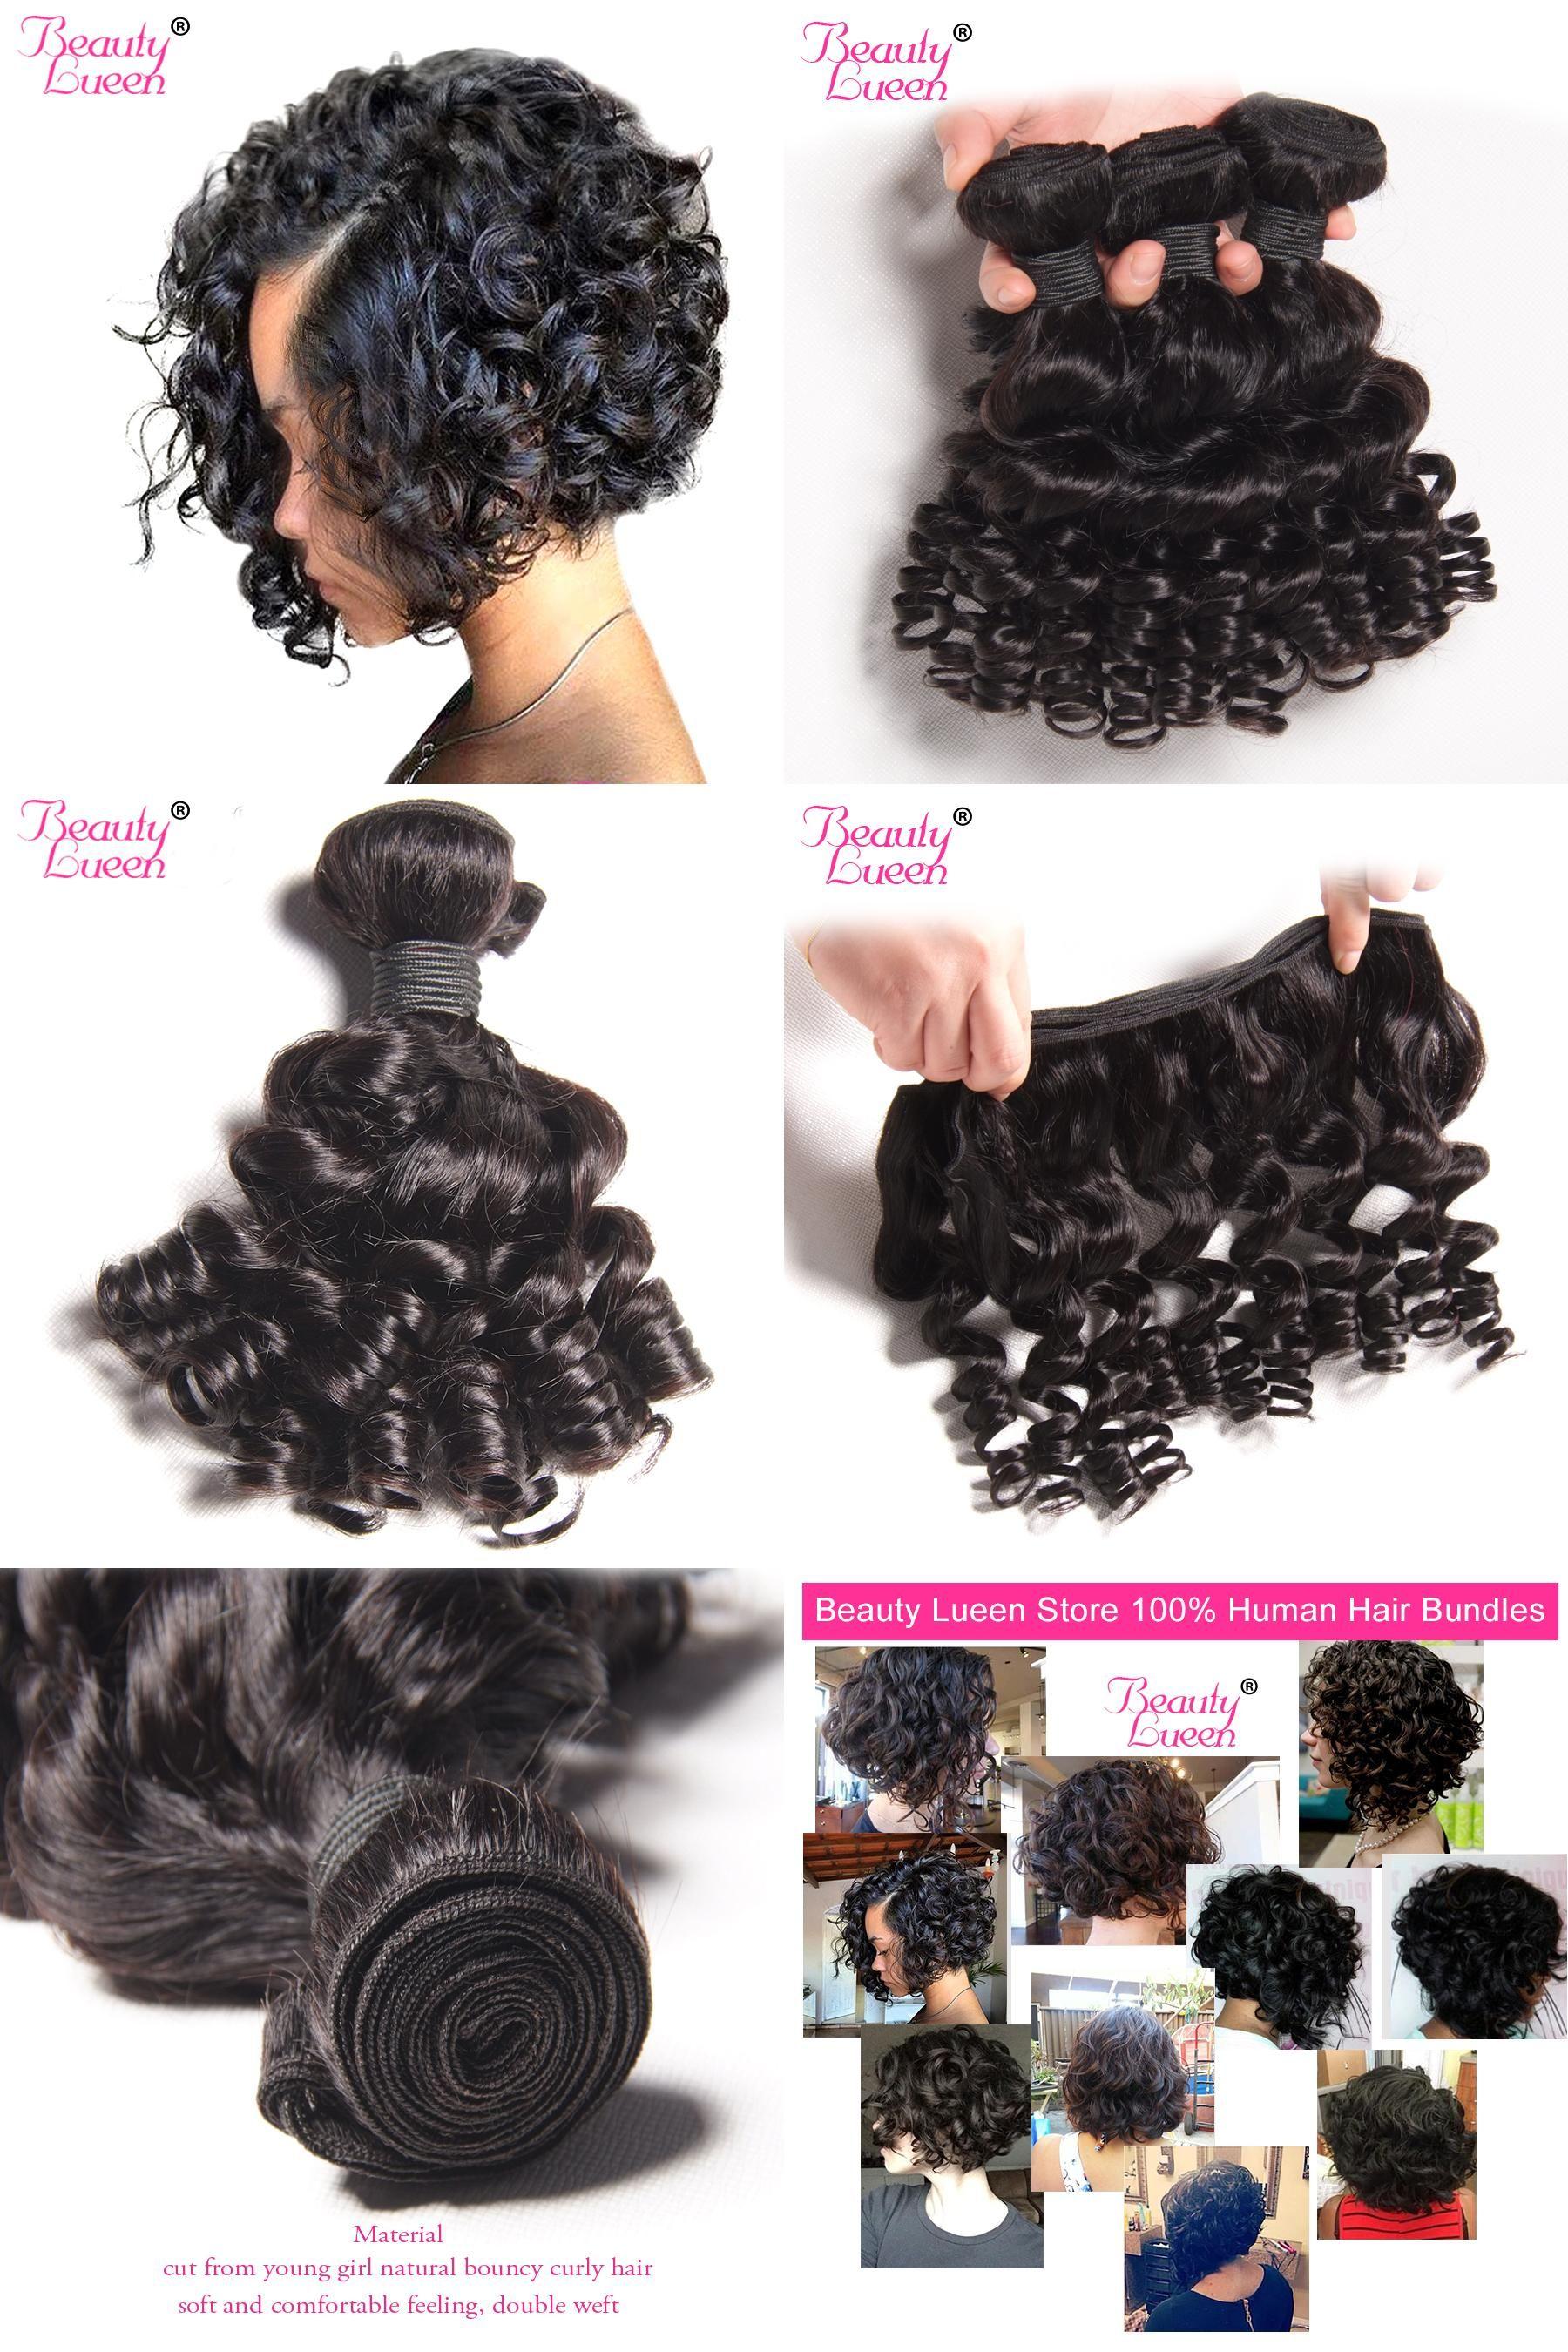 Visit To Buy Brazilian Hair Bundles Bouncy Curly Weave Human Hair Bundles Short Bob Style Brazilian Hair Weave Hair Bundles Extensions Brazilian Hair Bundles